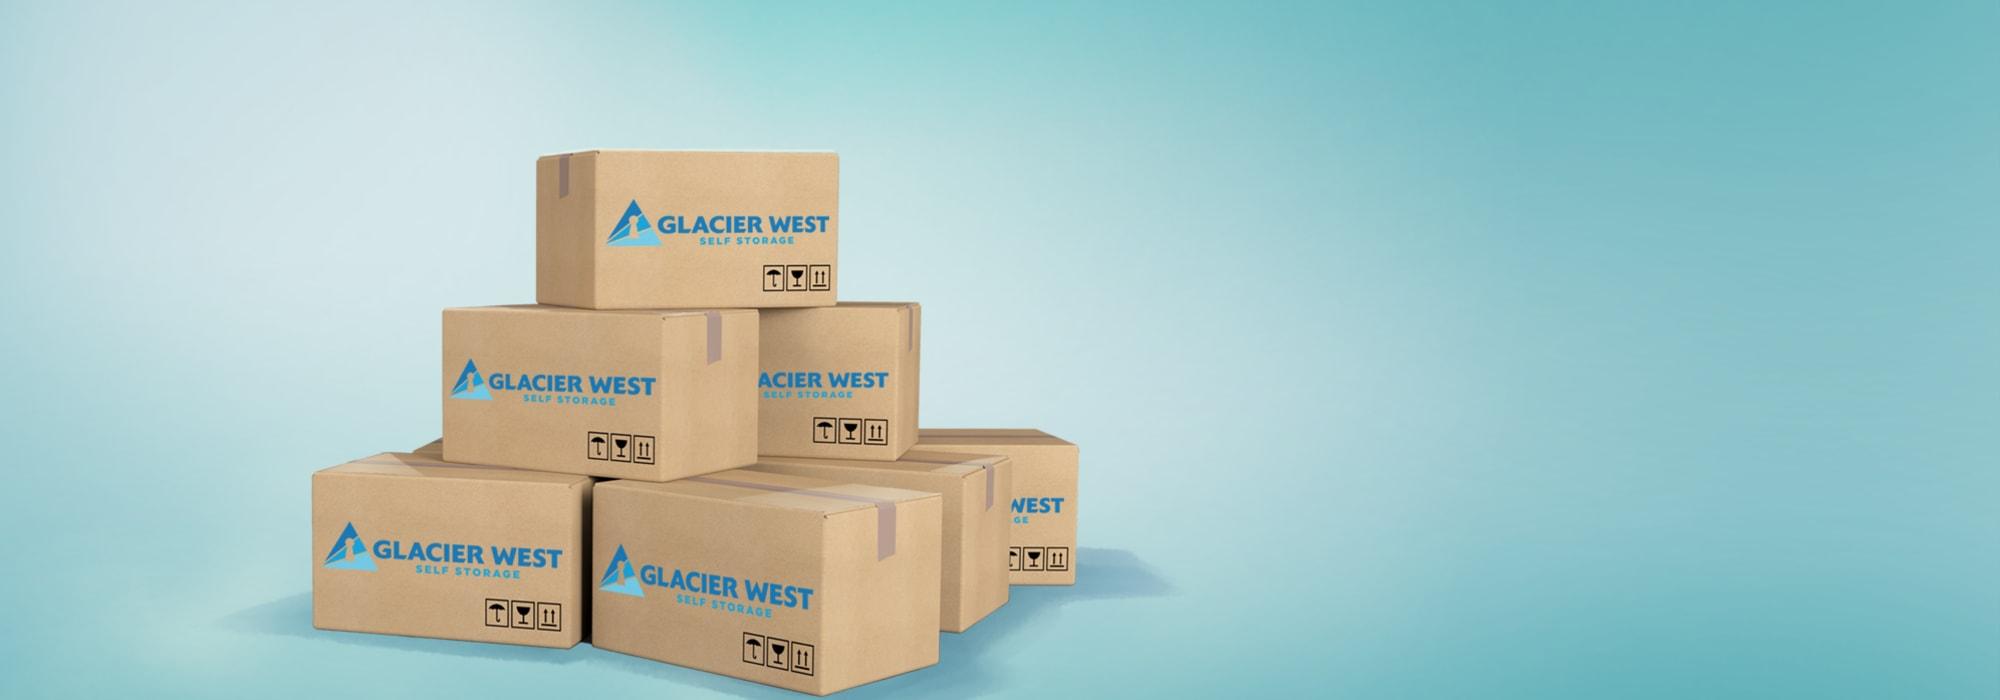 Glacier West Self Storage self storage in Arlington, Washington